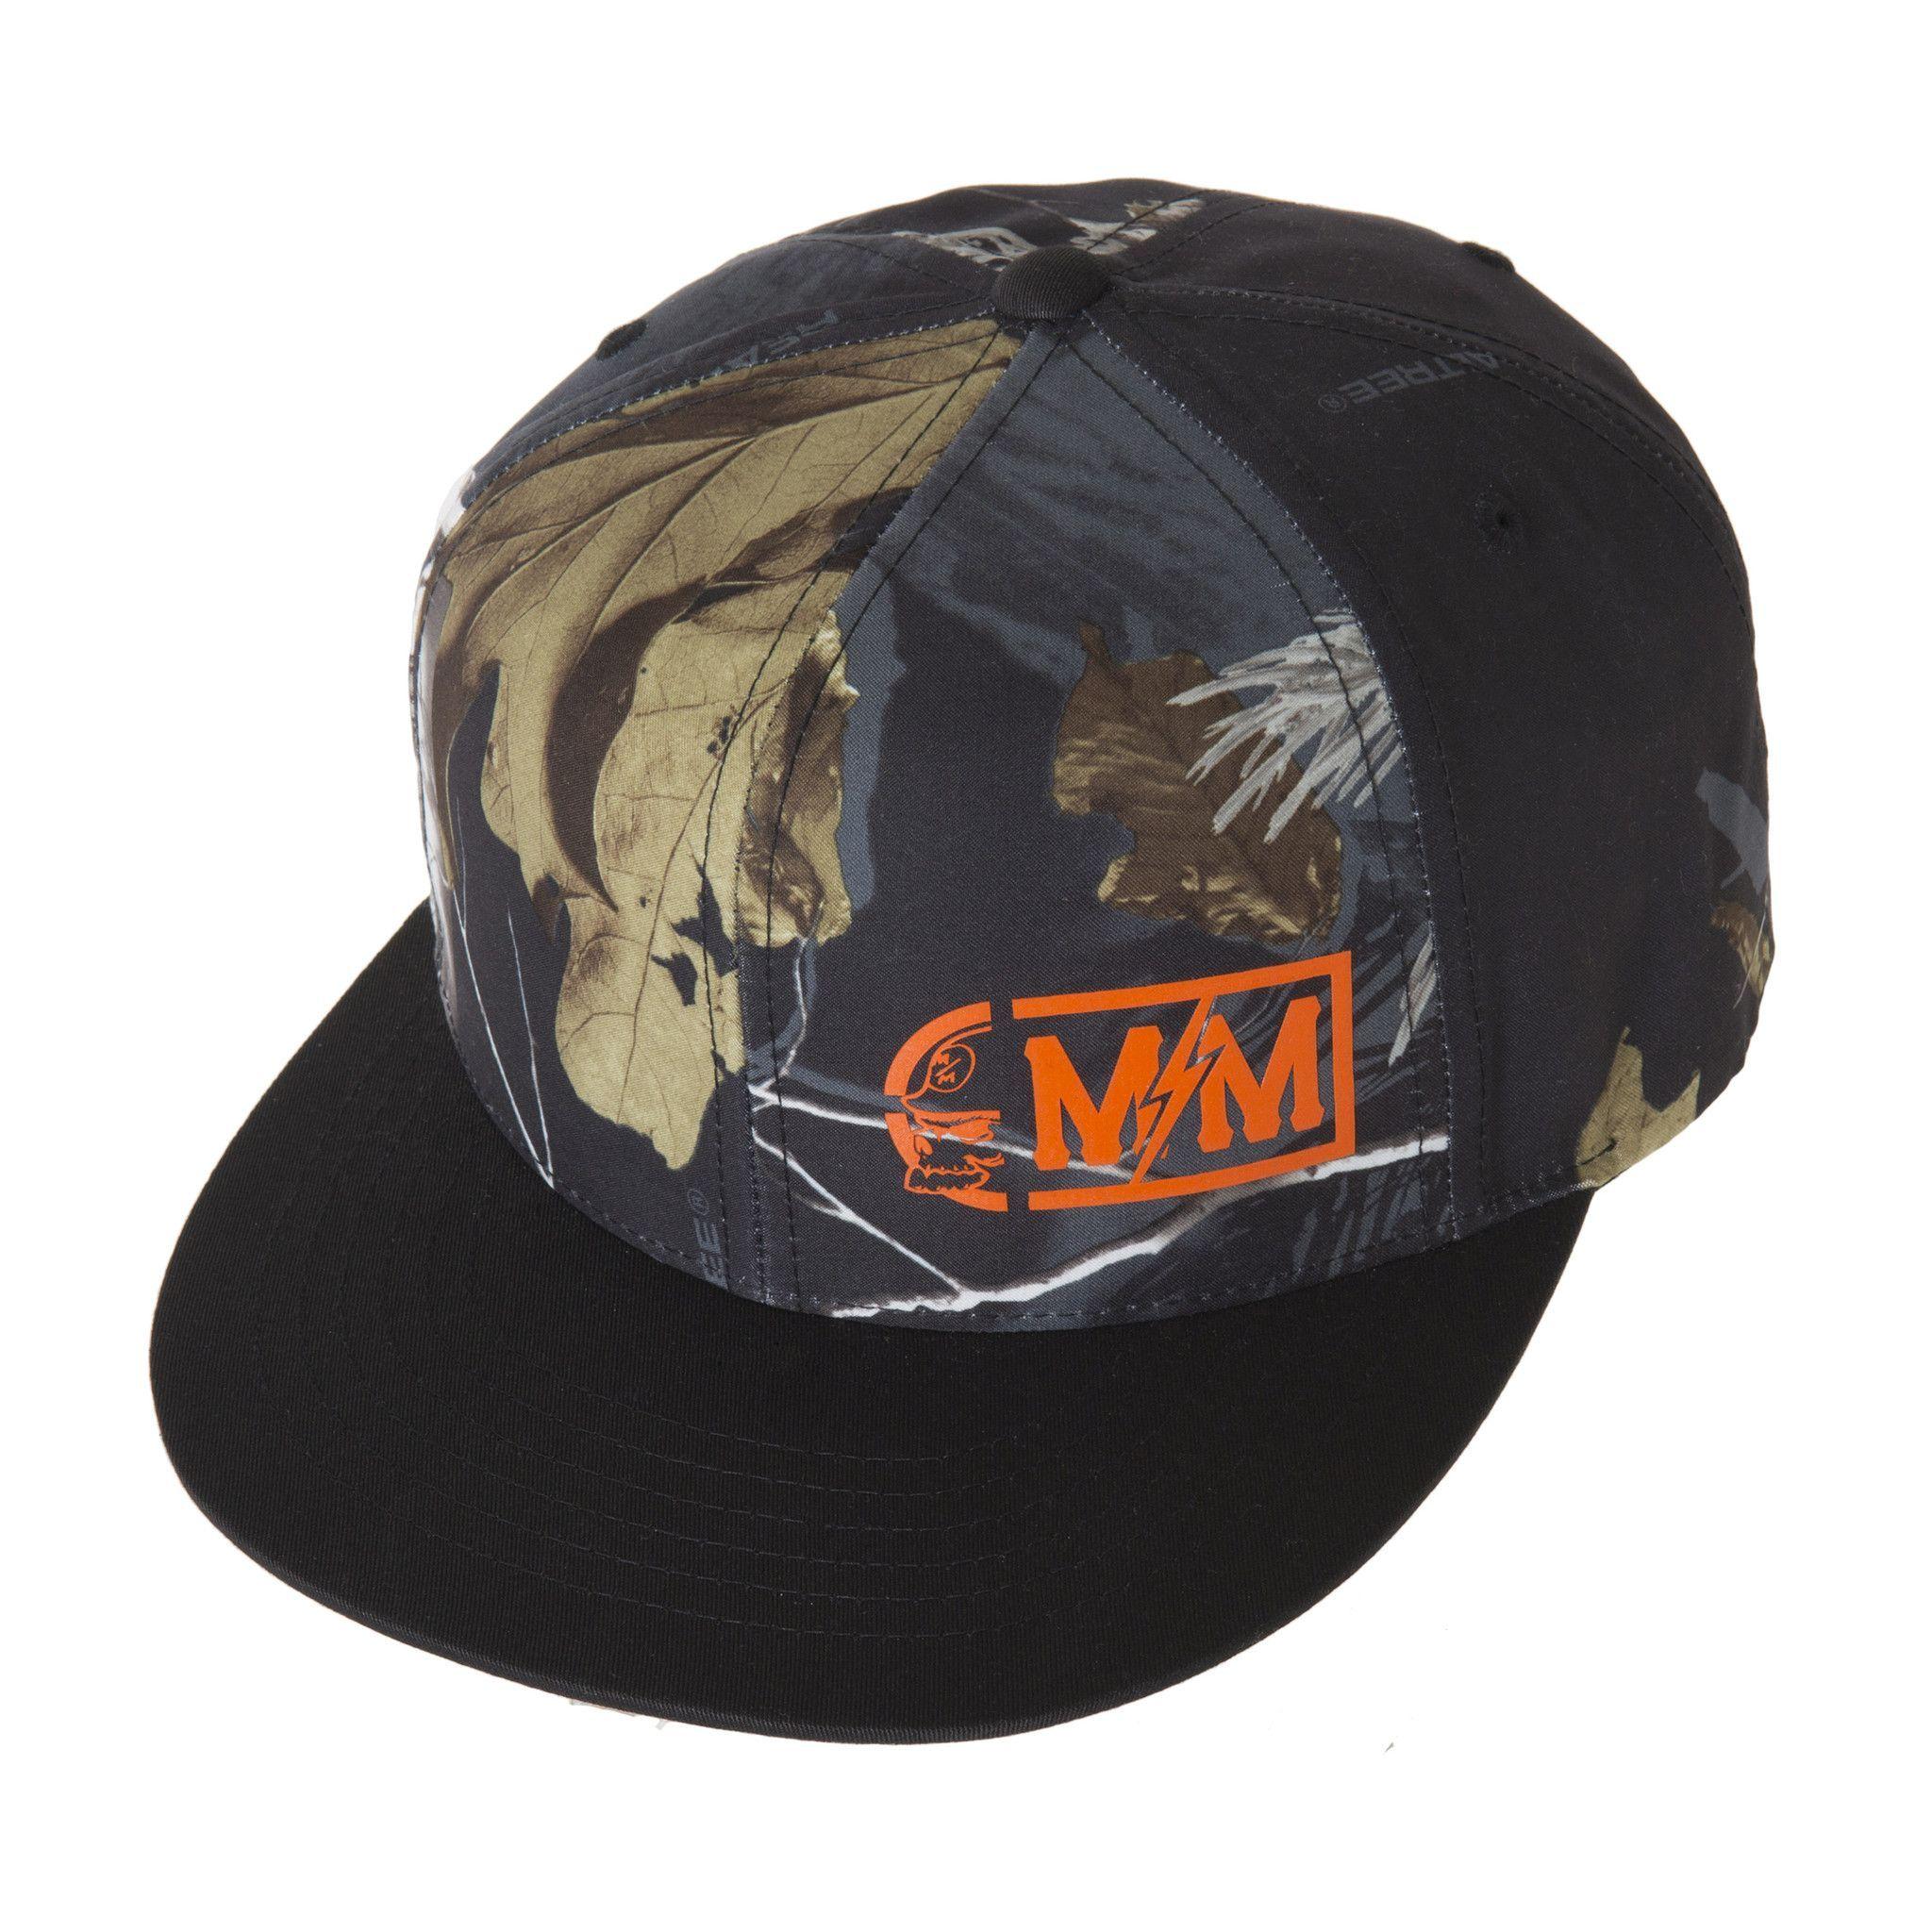 811369c2456 Metal Mulisha Men s Point Realtree Snapback Hat Dc Skate Shoes